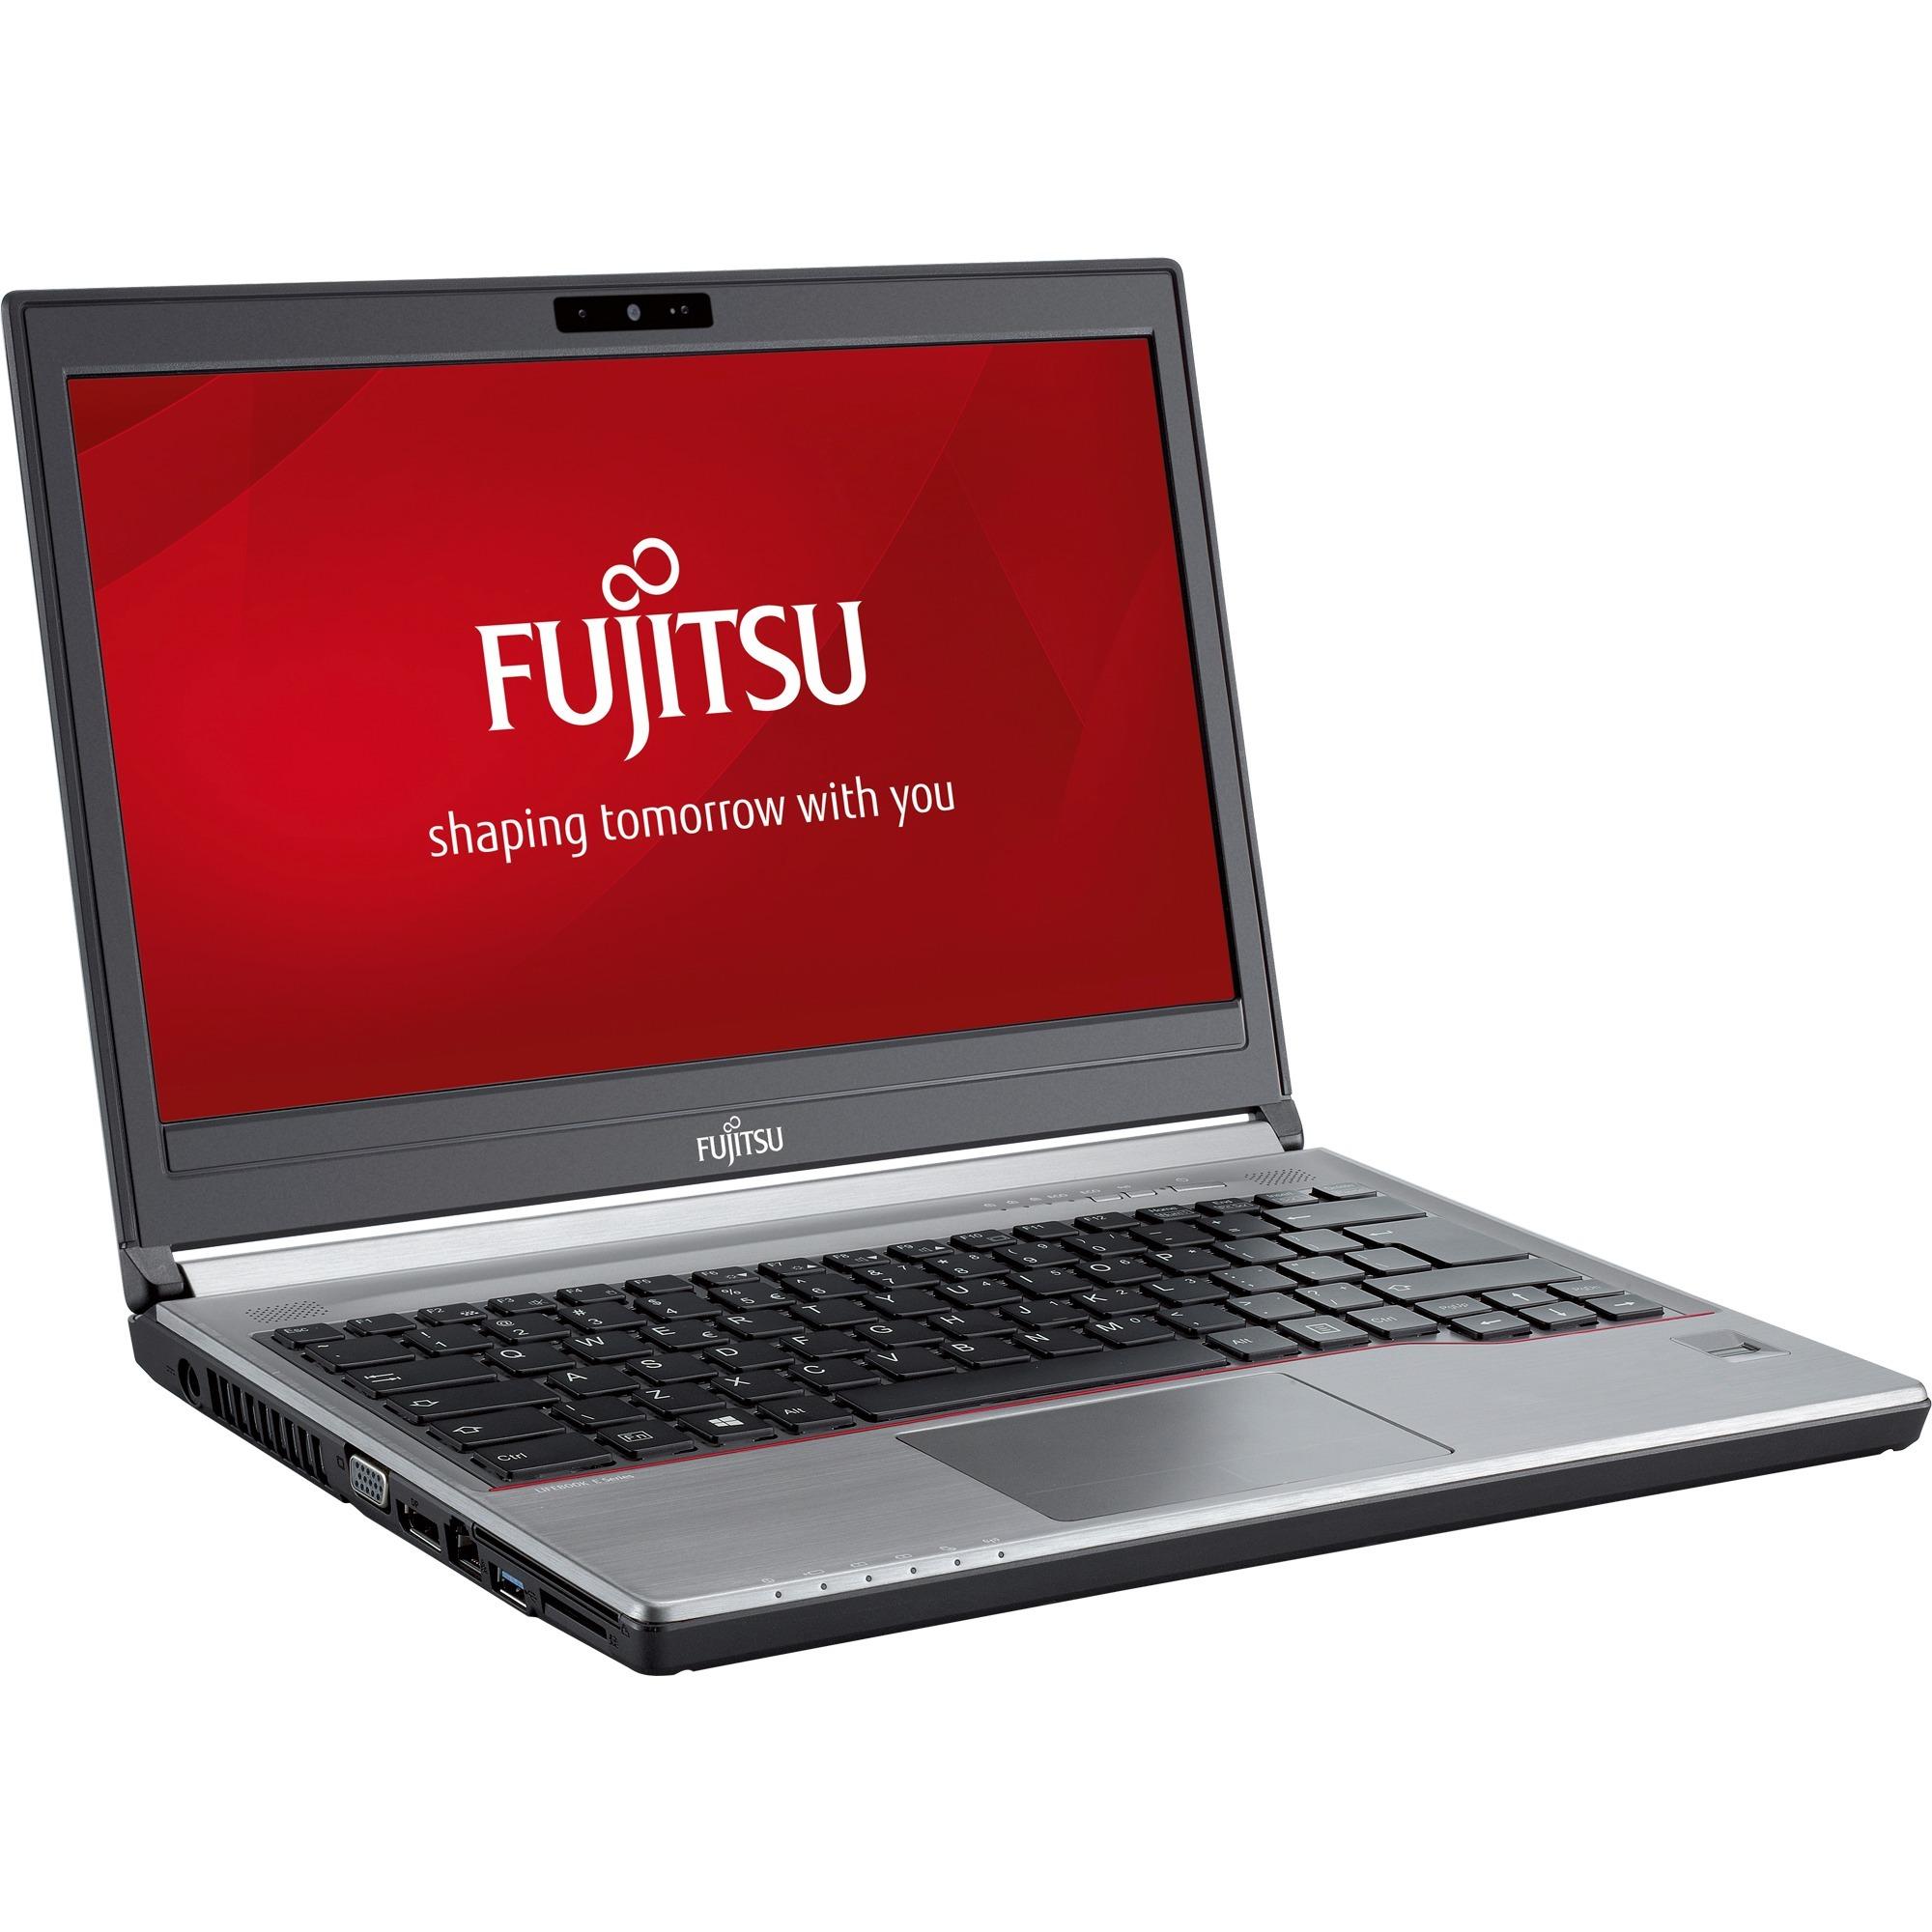 fujitsu lifebook e734 hd vfy e7340m75abde notebook. Black Bedroom Furniture Sets. Home Design Ideas